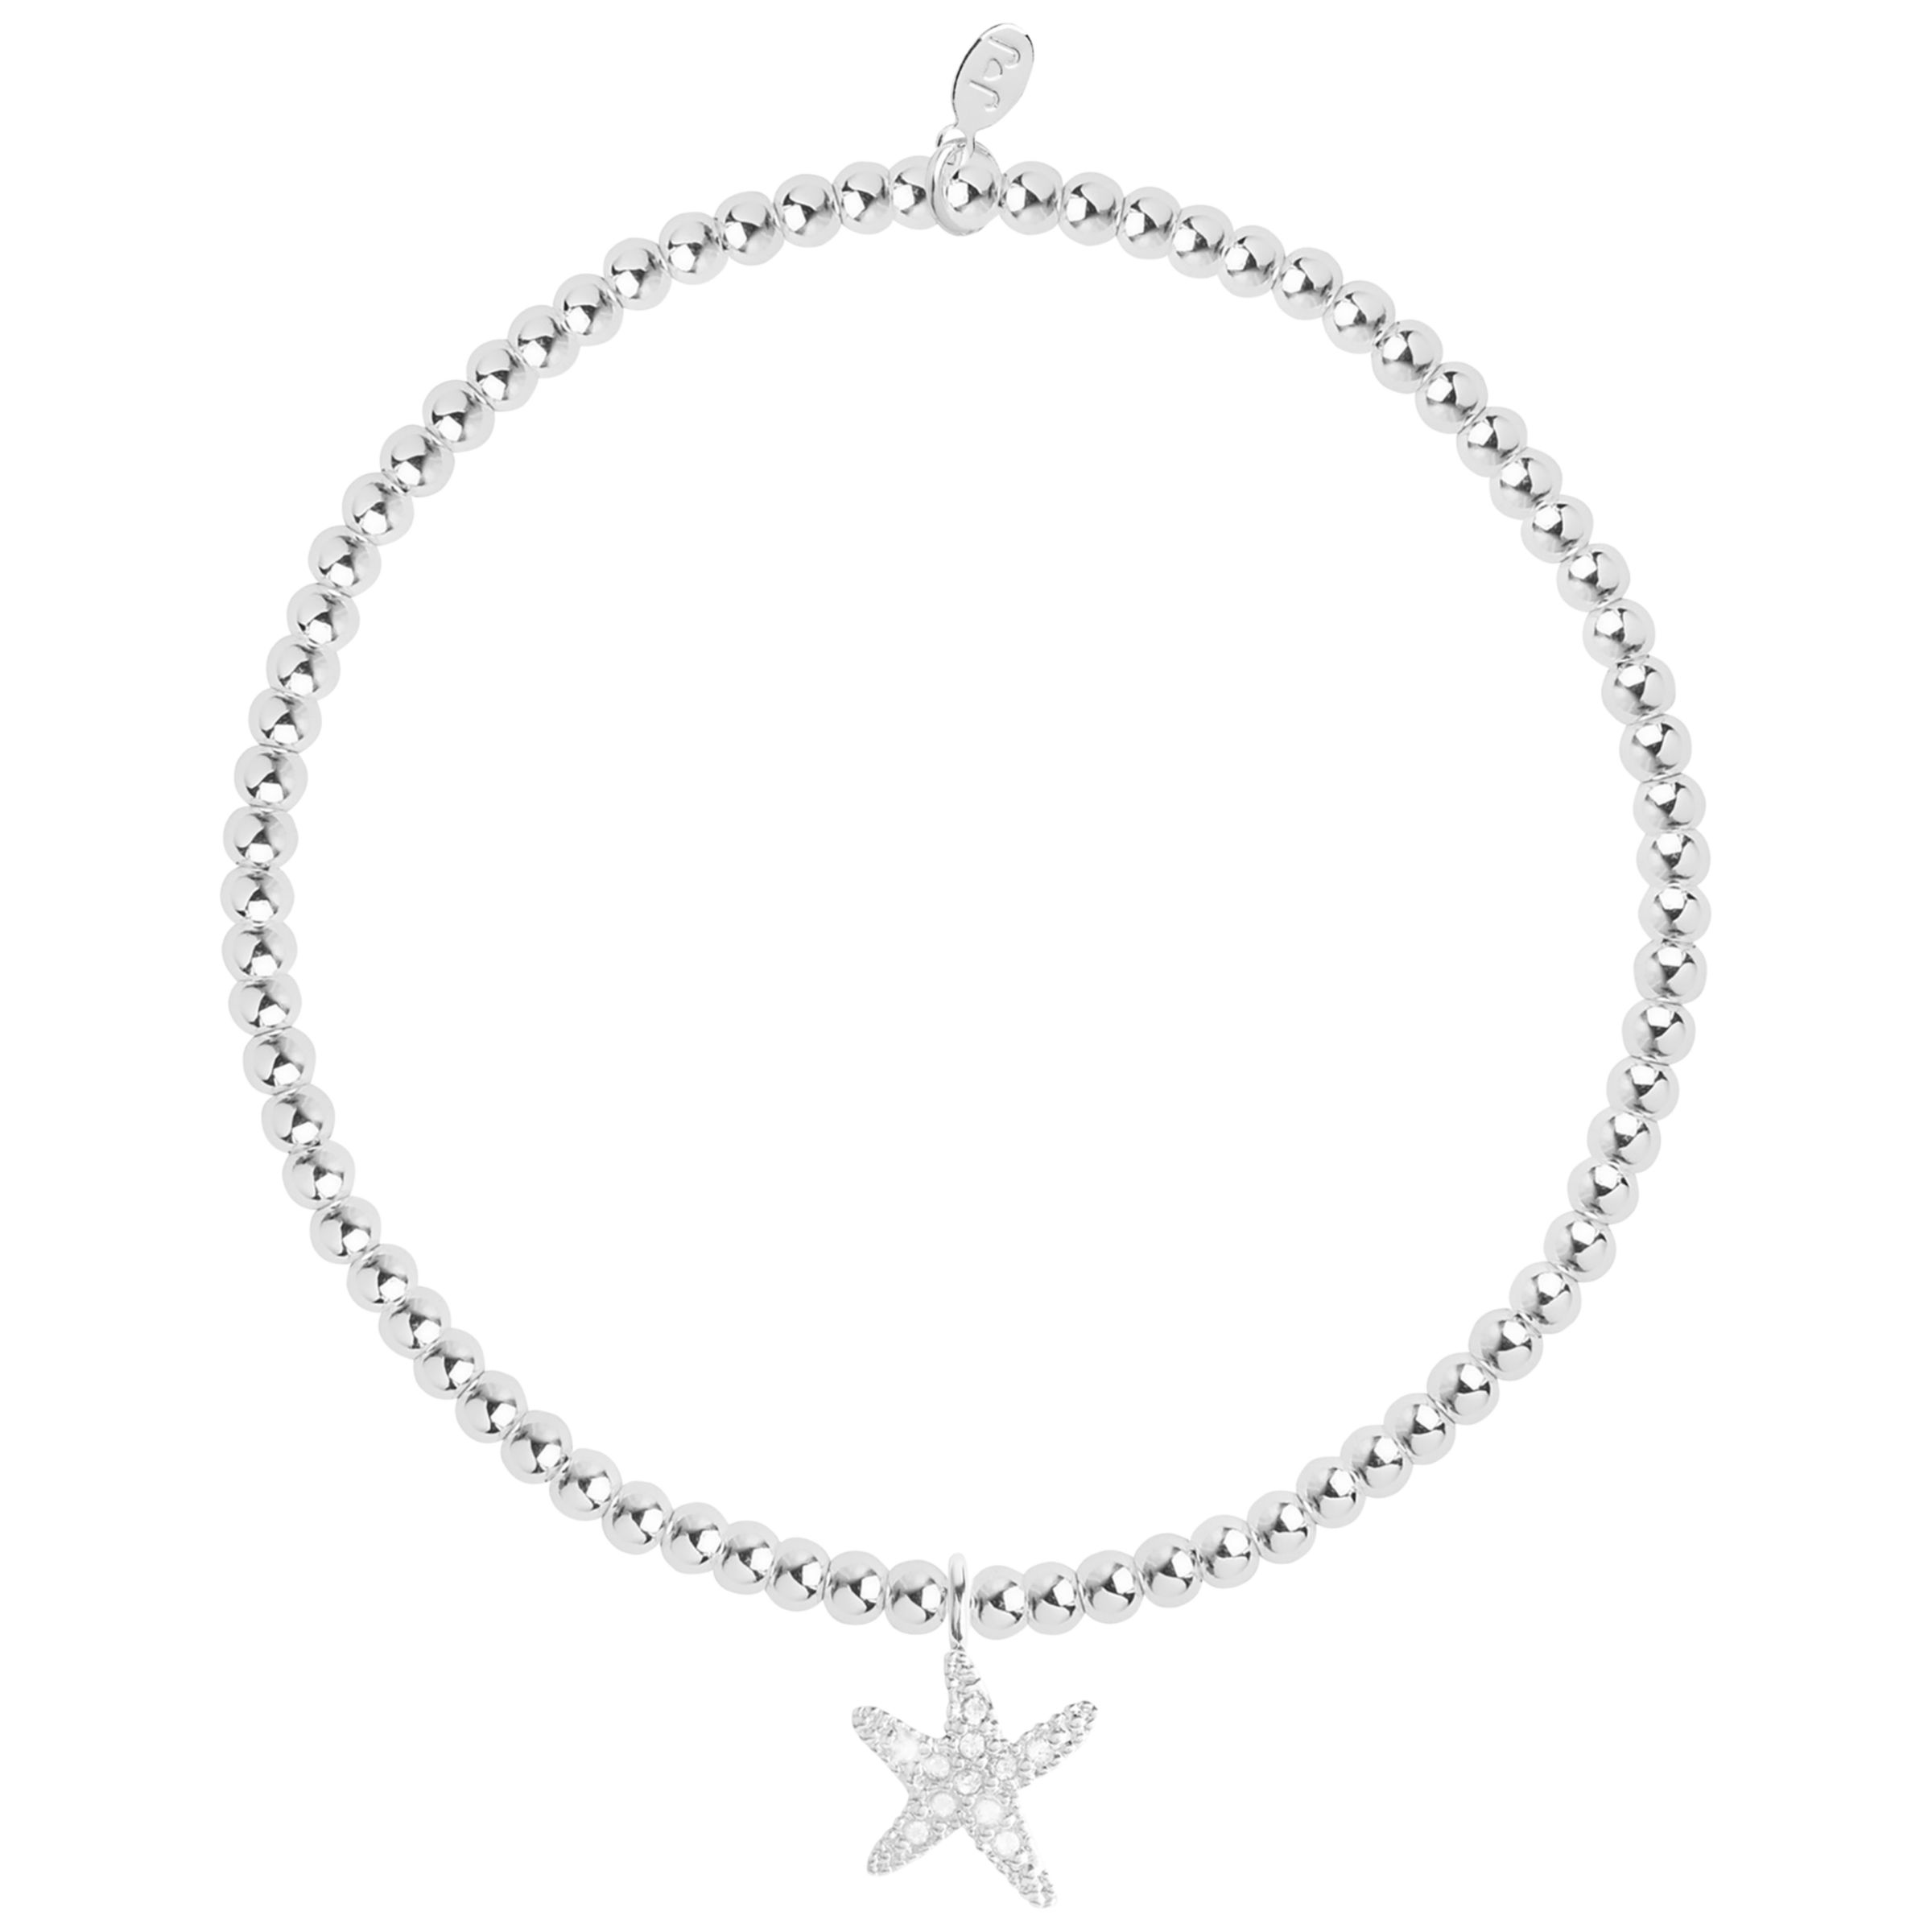 Joma Joma Sofia Beaded Starfish Bracelet, Silver